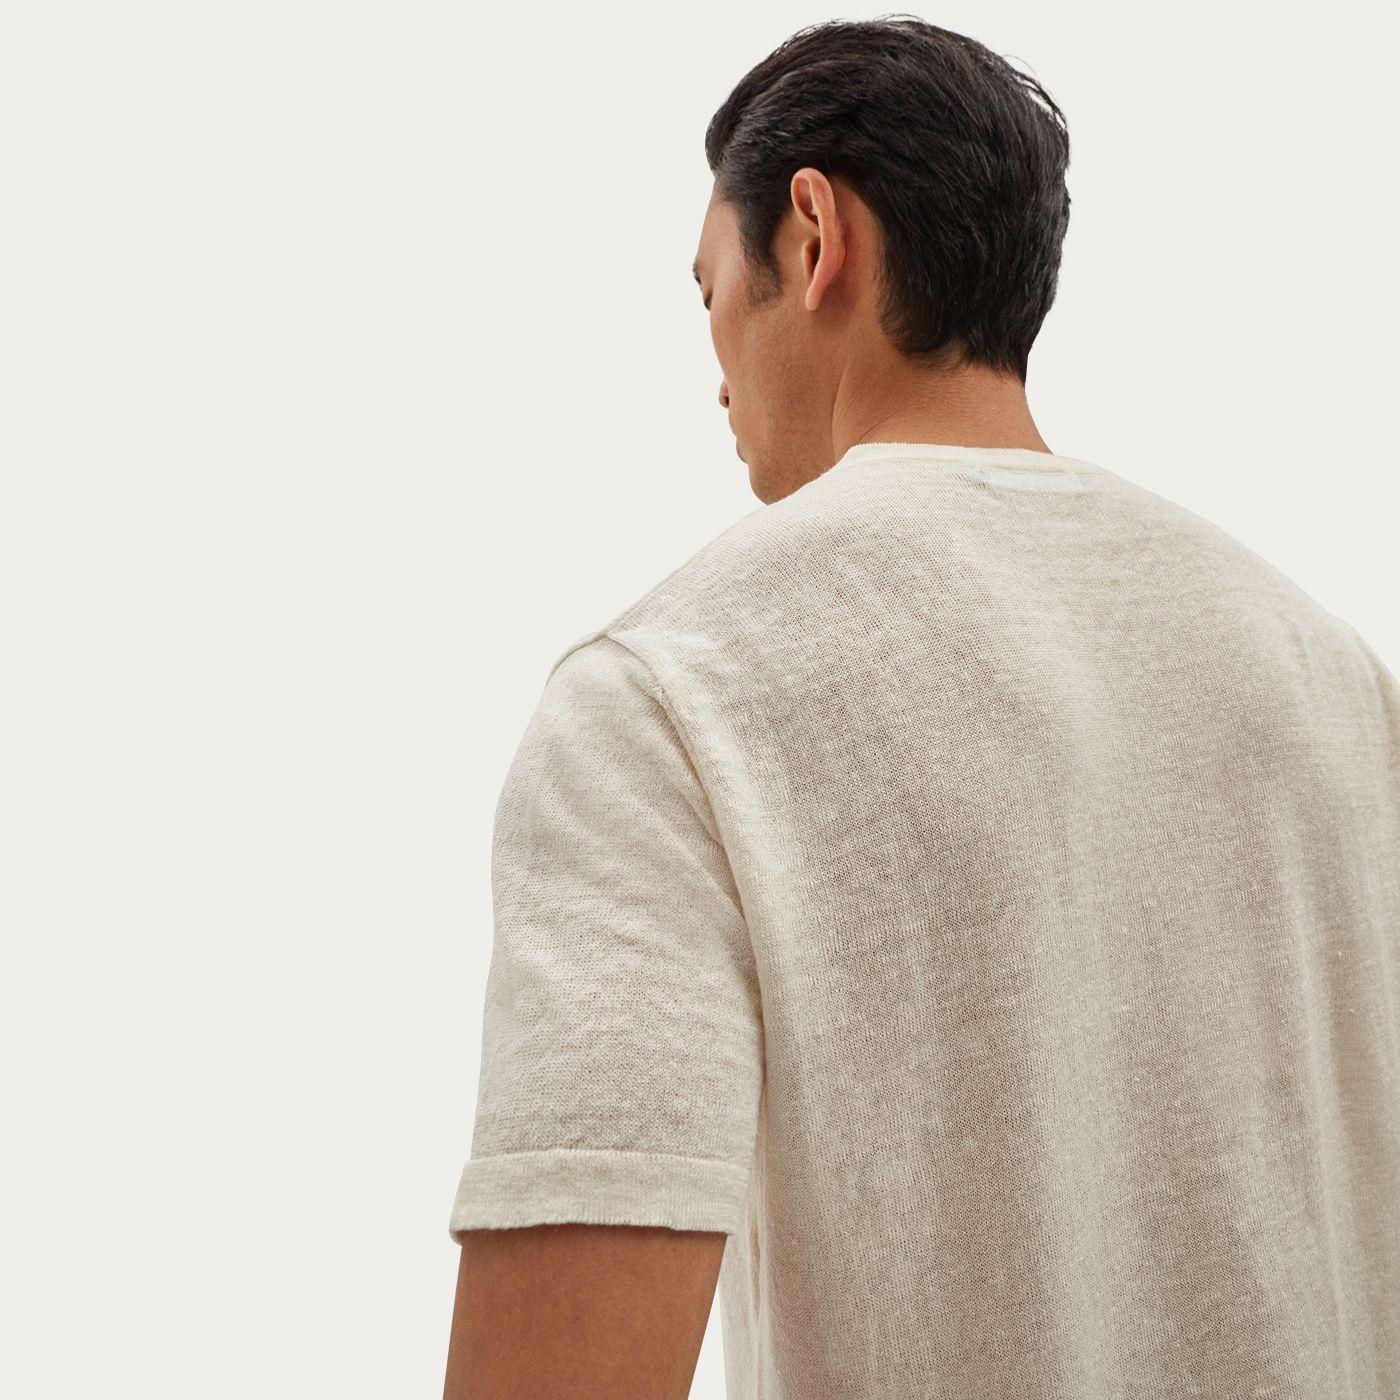 Ivory Linen Knit T-Shirt | Bombinate